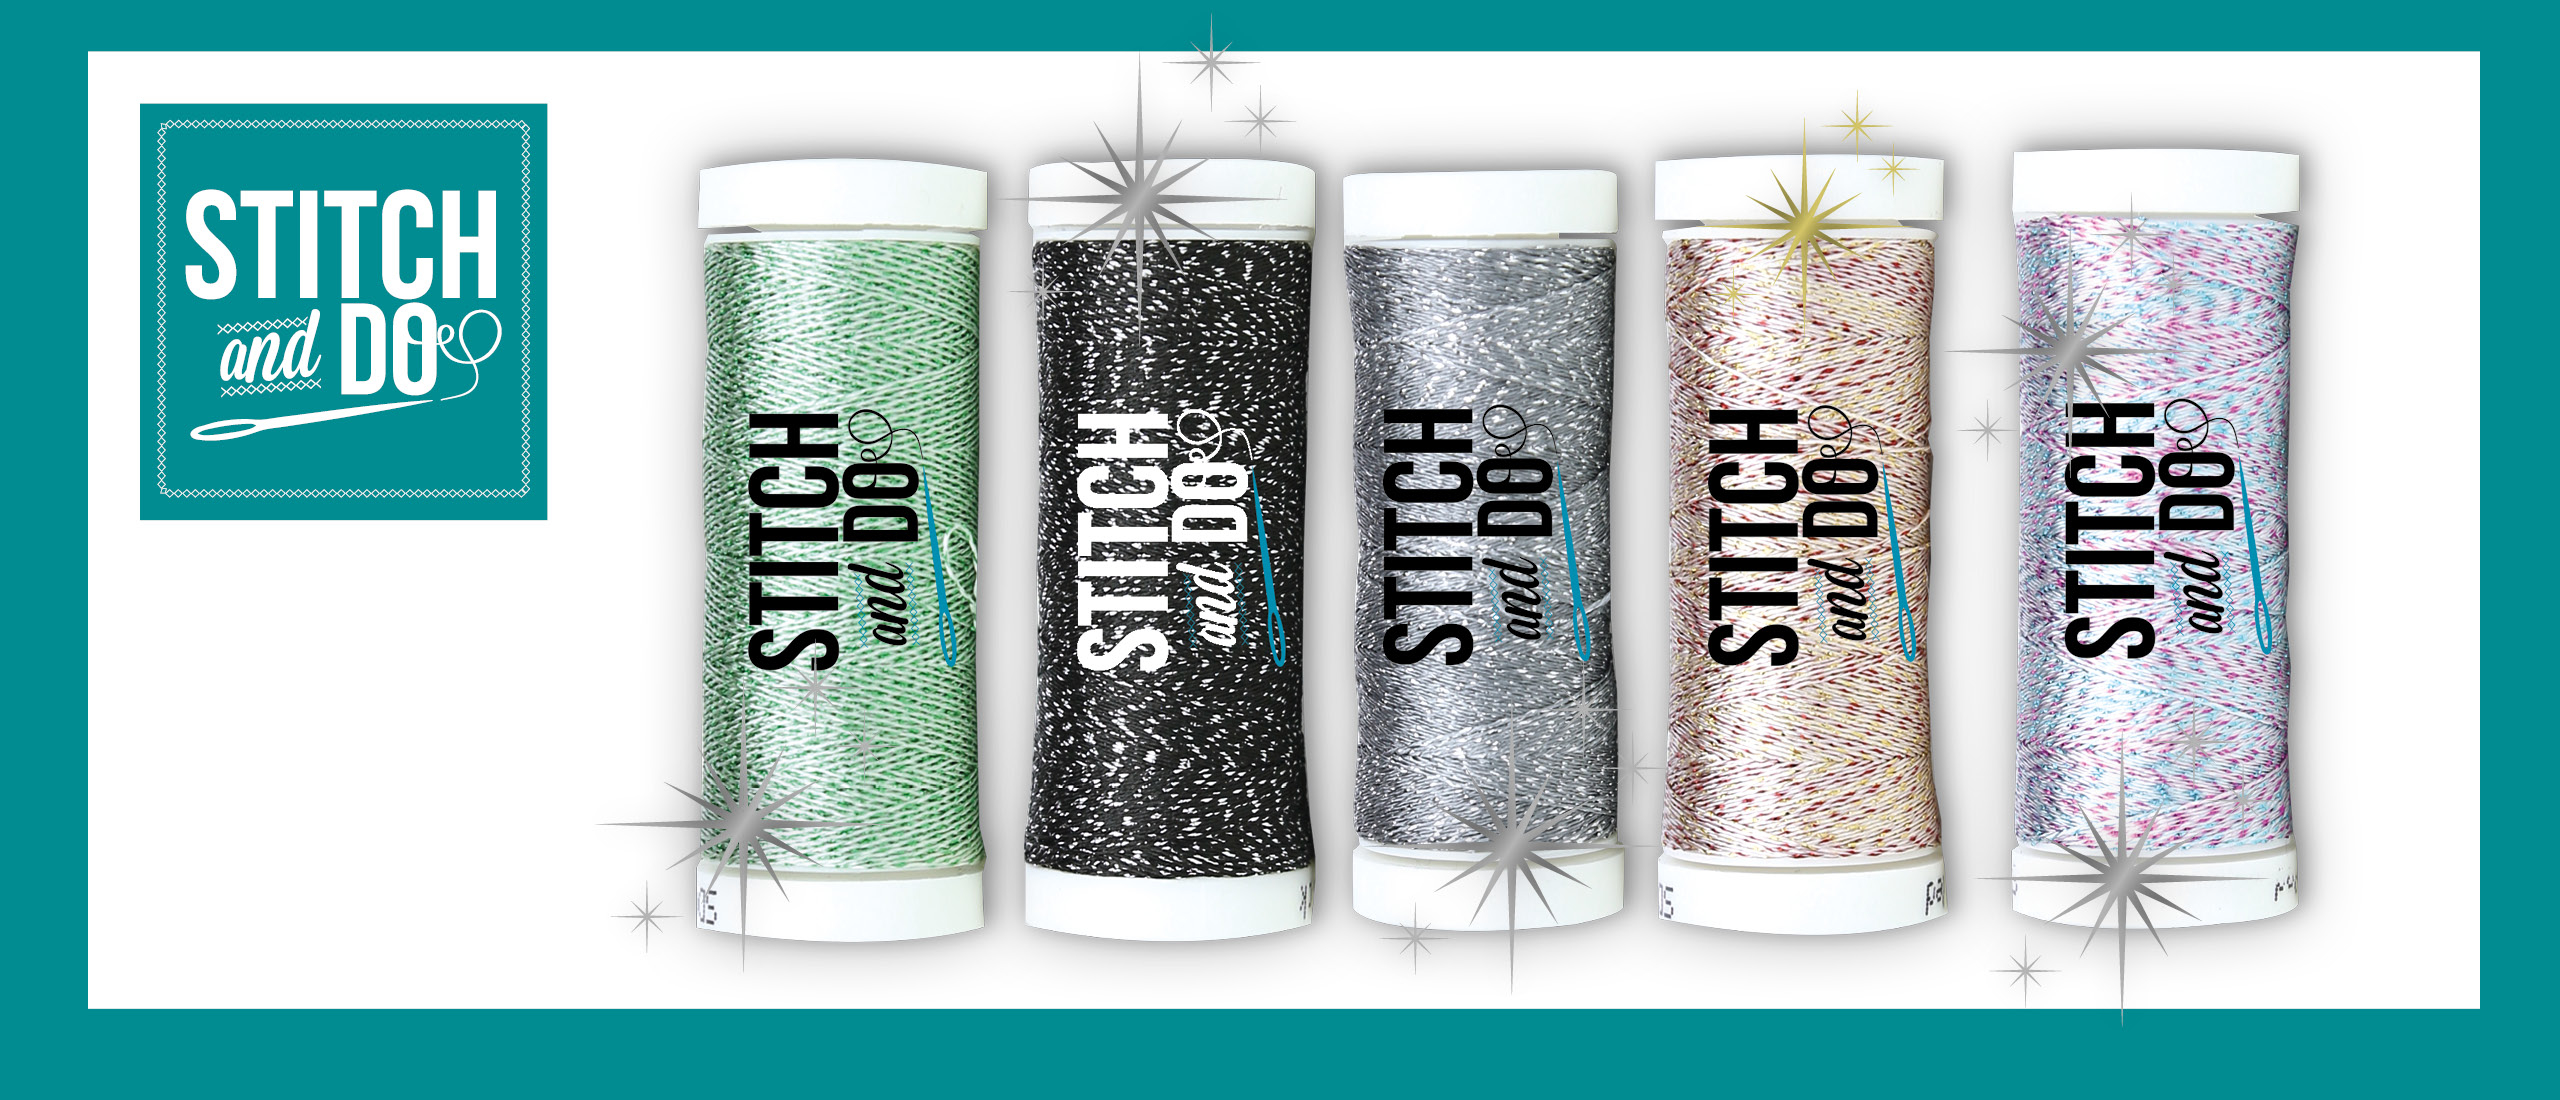 🆕 Stitch & Do Sparkles Embroidery Thread: Black, Multicolor Blue, Multicolor Red, Silver-Green, Steel